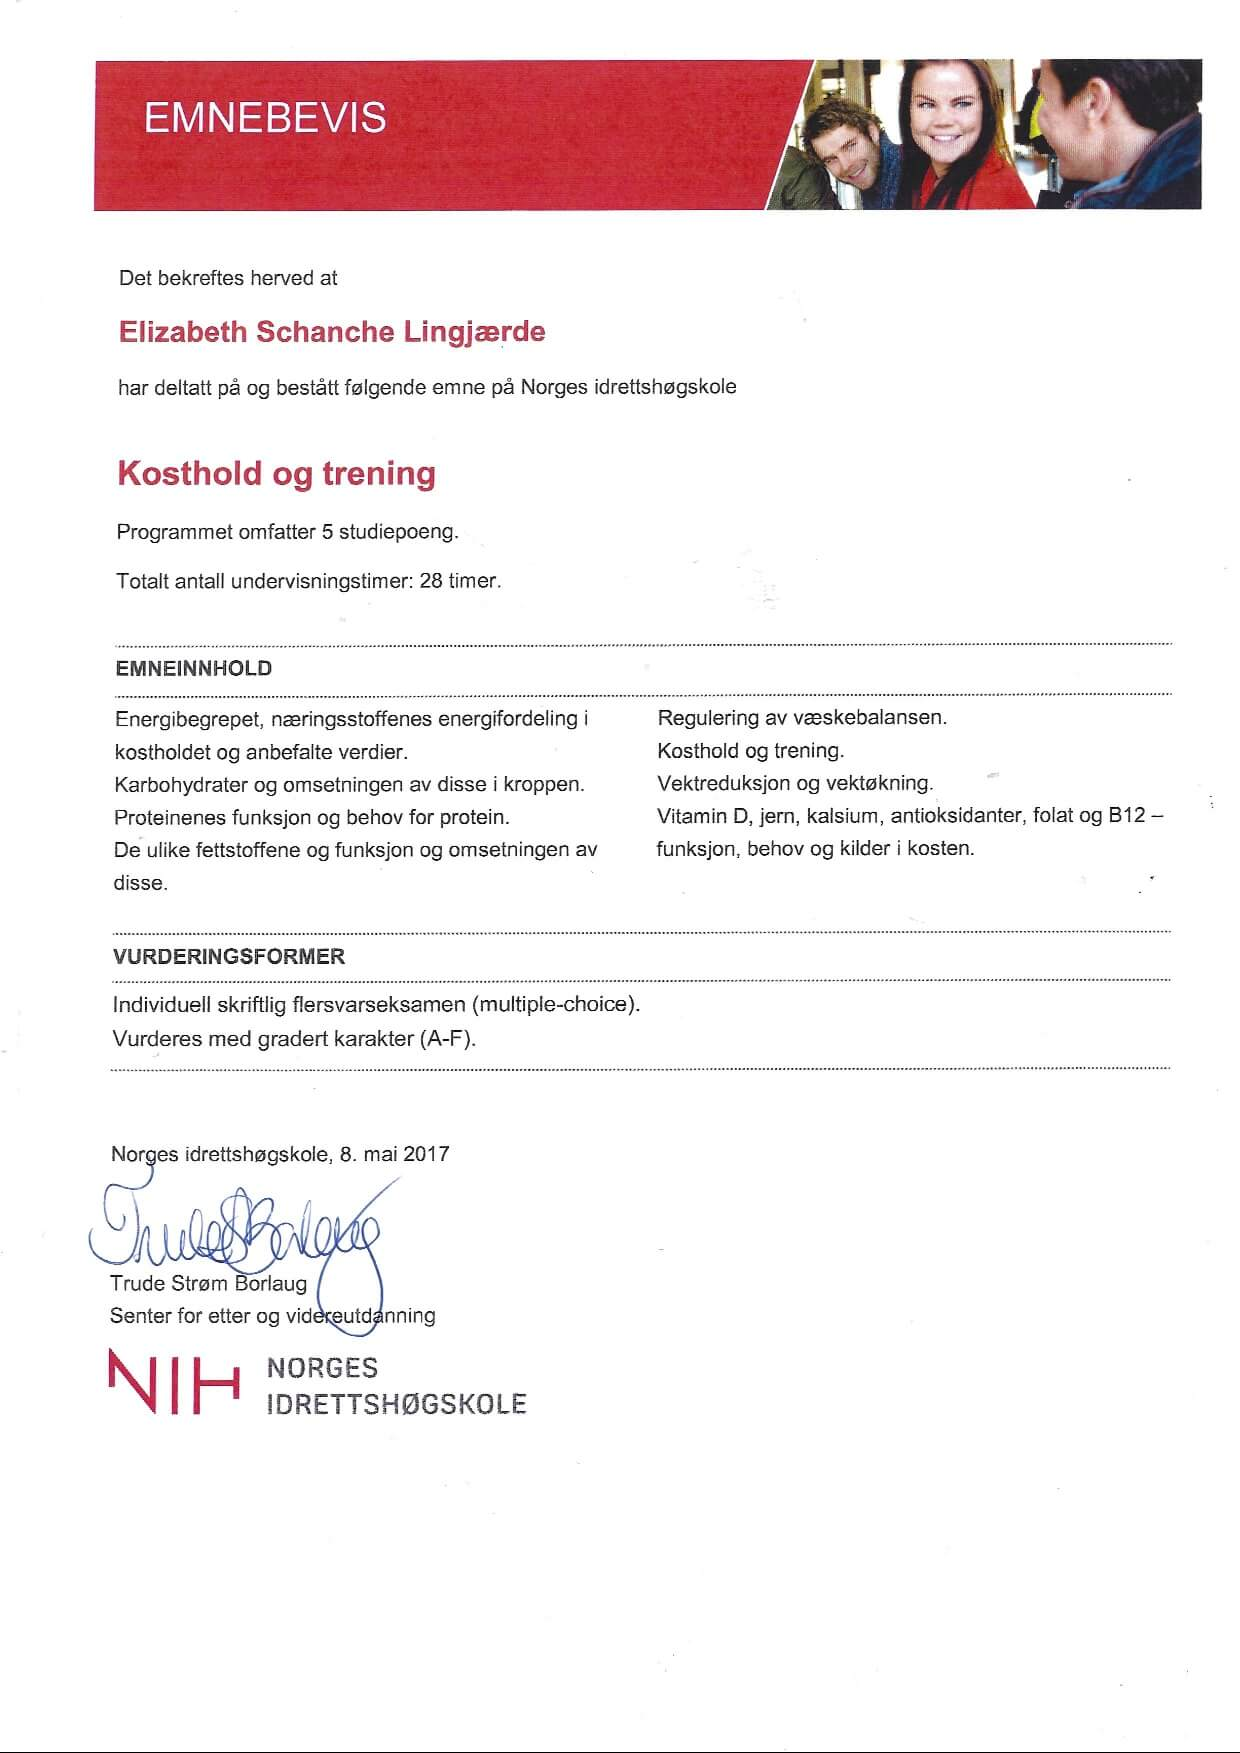 Norges Idrettshøgskole